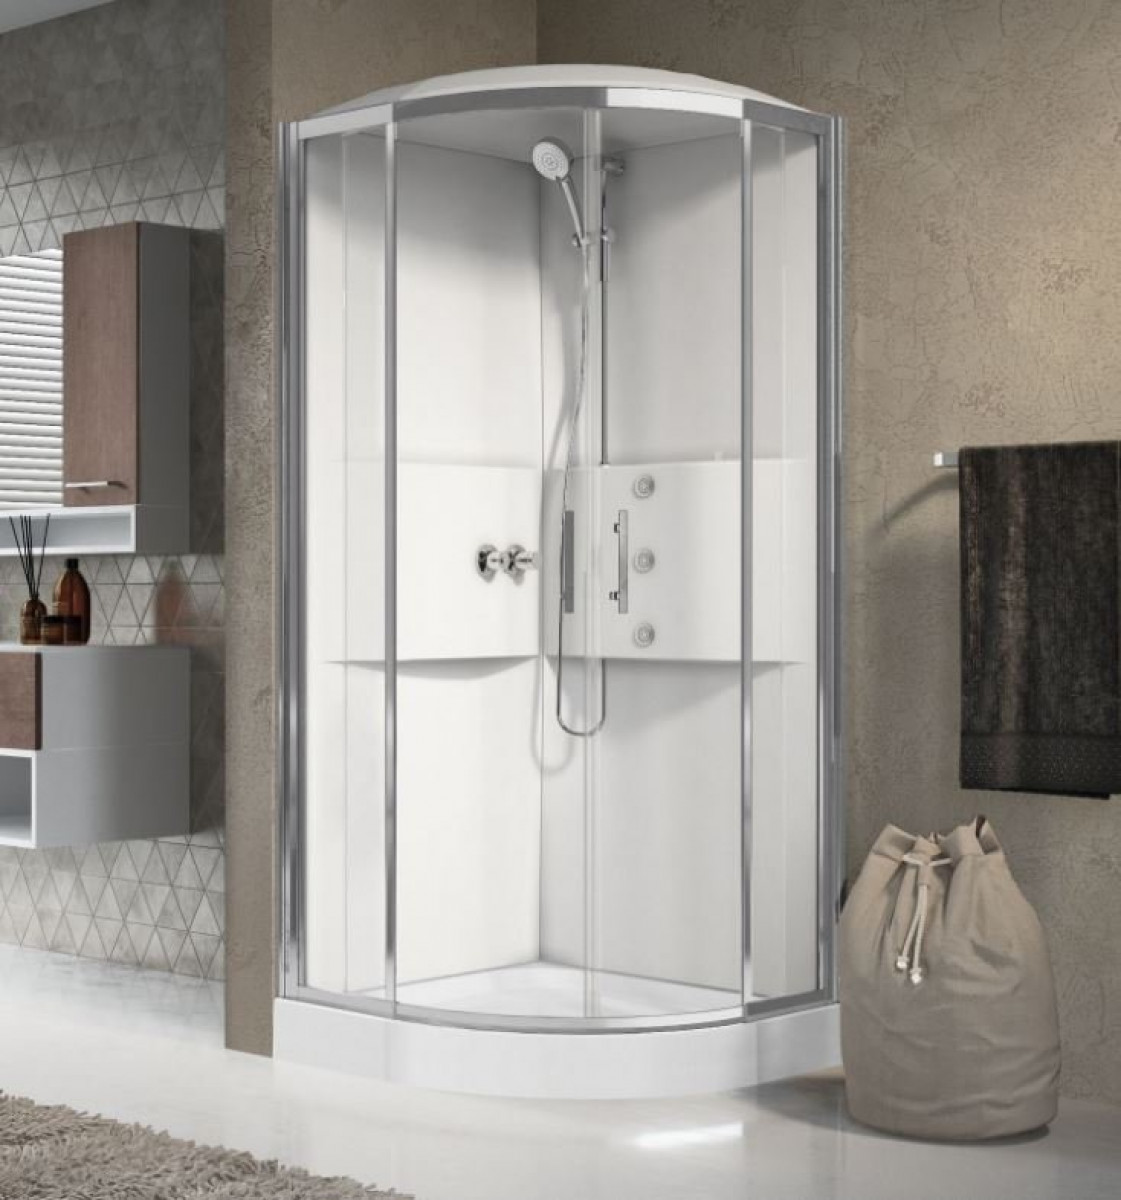 Novellini Media 900 Quadrant Complete Shower Enclosure & Shower Tray -